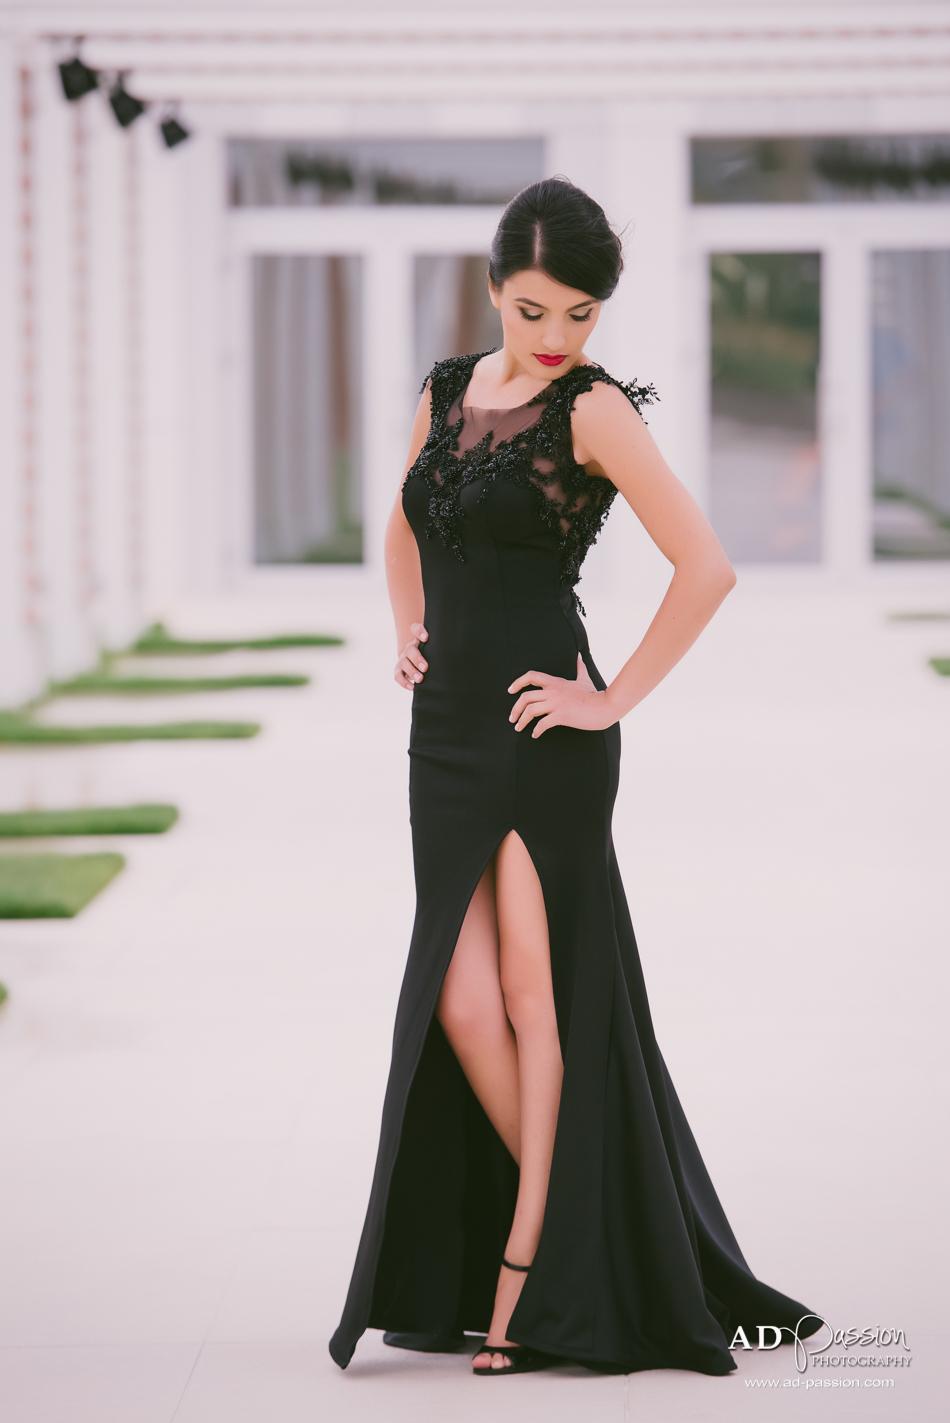 AD Passion Photography   20150625_claudia-irene-fotograf-absolventi-sedinta-foto-banchet_0016   Adelin, Dida, fotograf profesionist, fotograf de nunta, fotografie de nunta, fotograf Timisoara, fotograf Craiova, fotograf Bucuresti, fotograf Arad, nunta Timisoara, nunta Arad, nunta Bucuresti, nunta Craiova